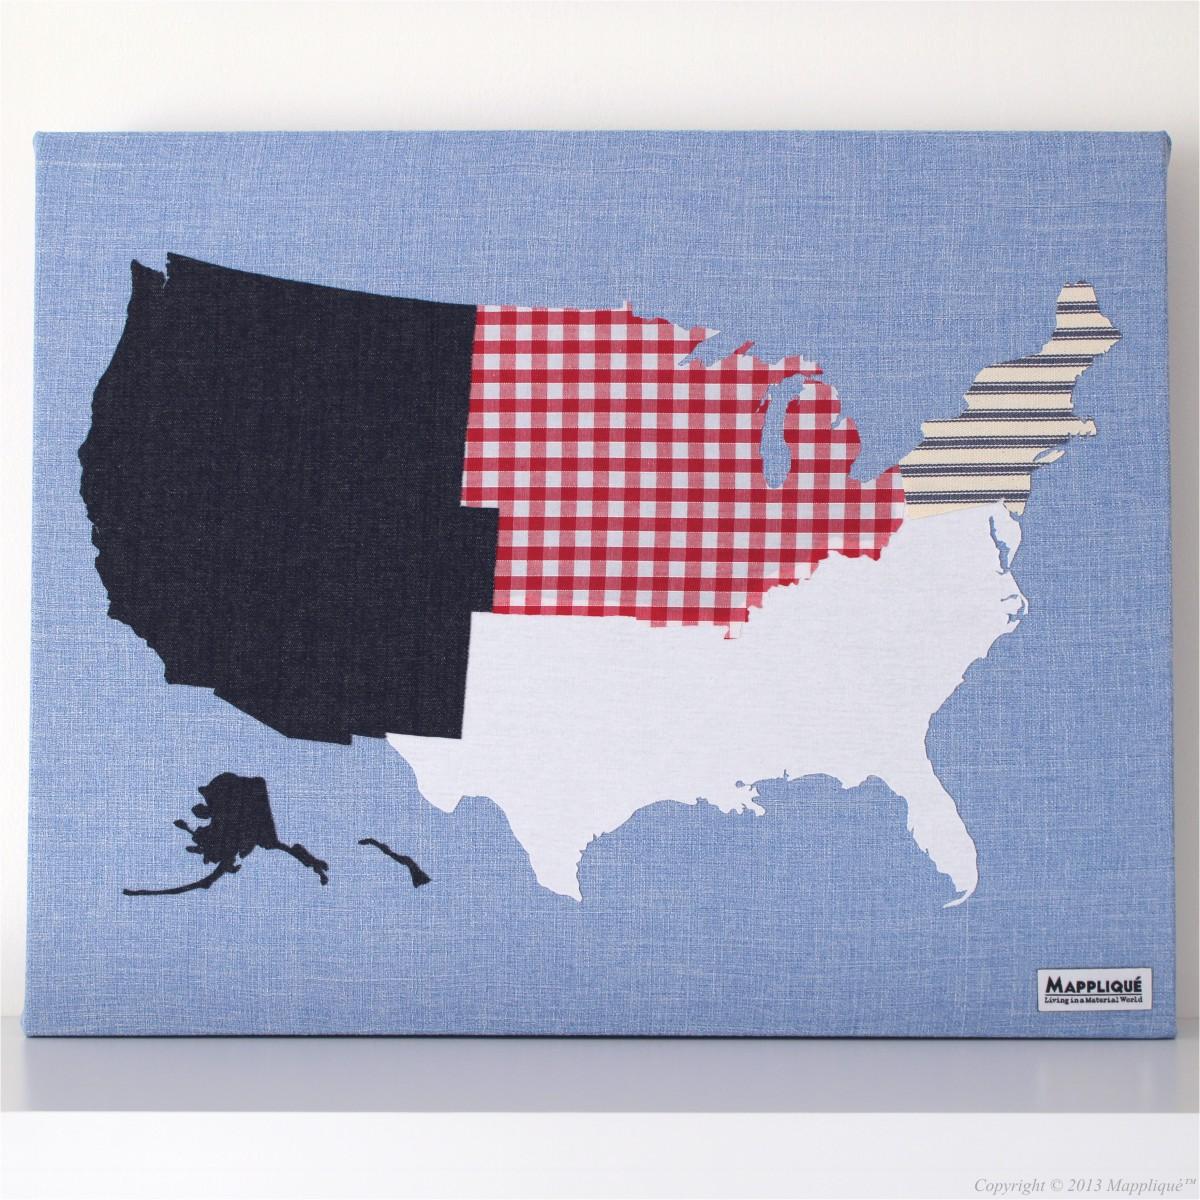 USA Regions Fabric Map Wall Art - Mappliqué